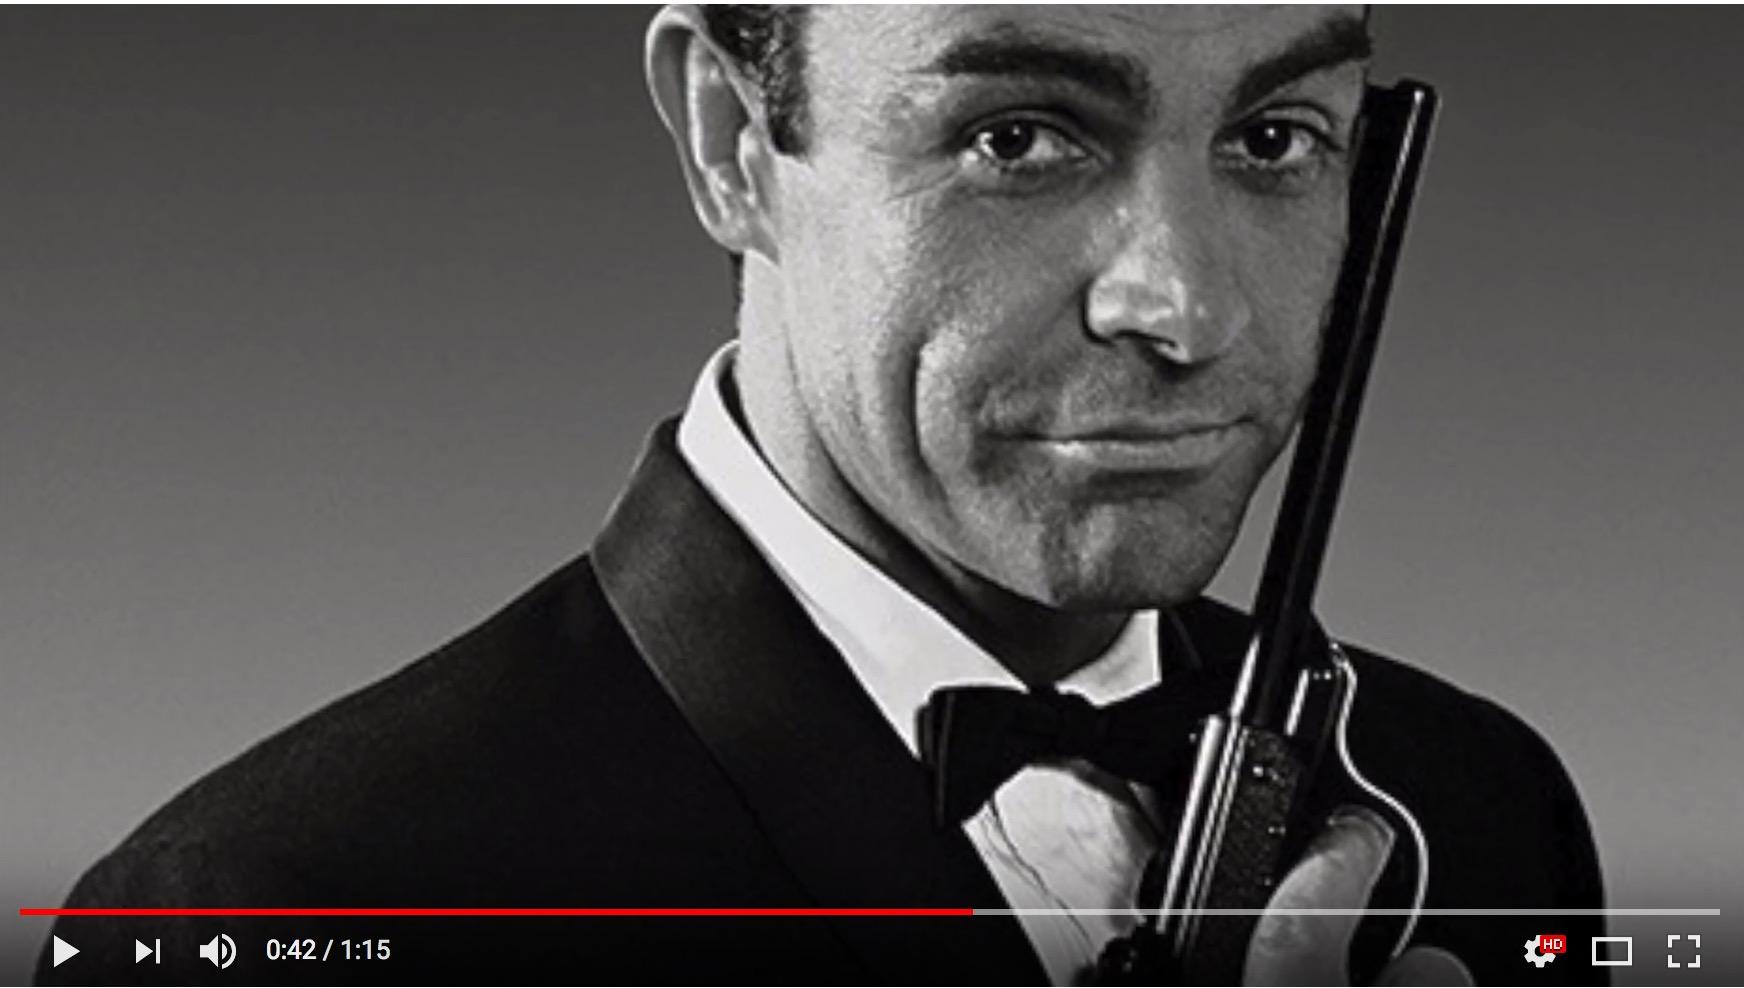 J/99, Agent 99, or Bond 007?